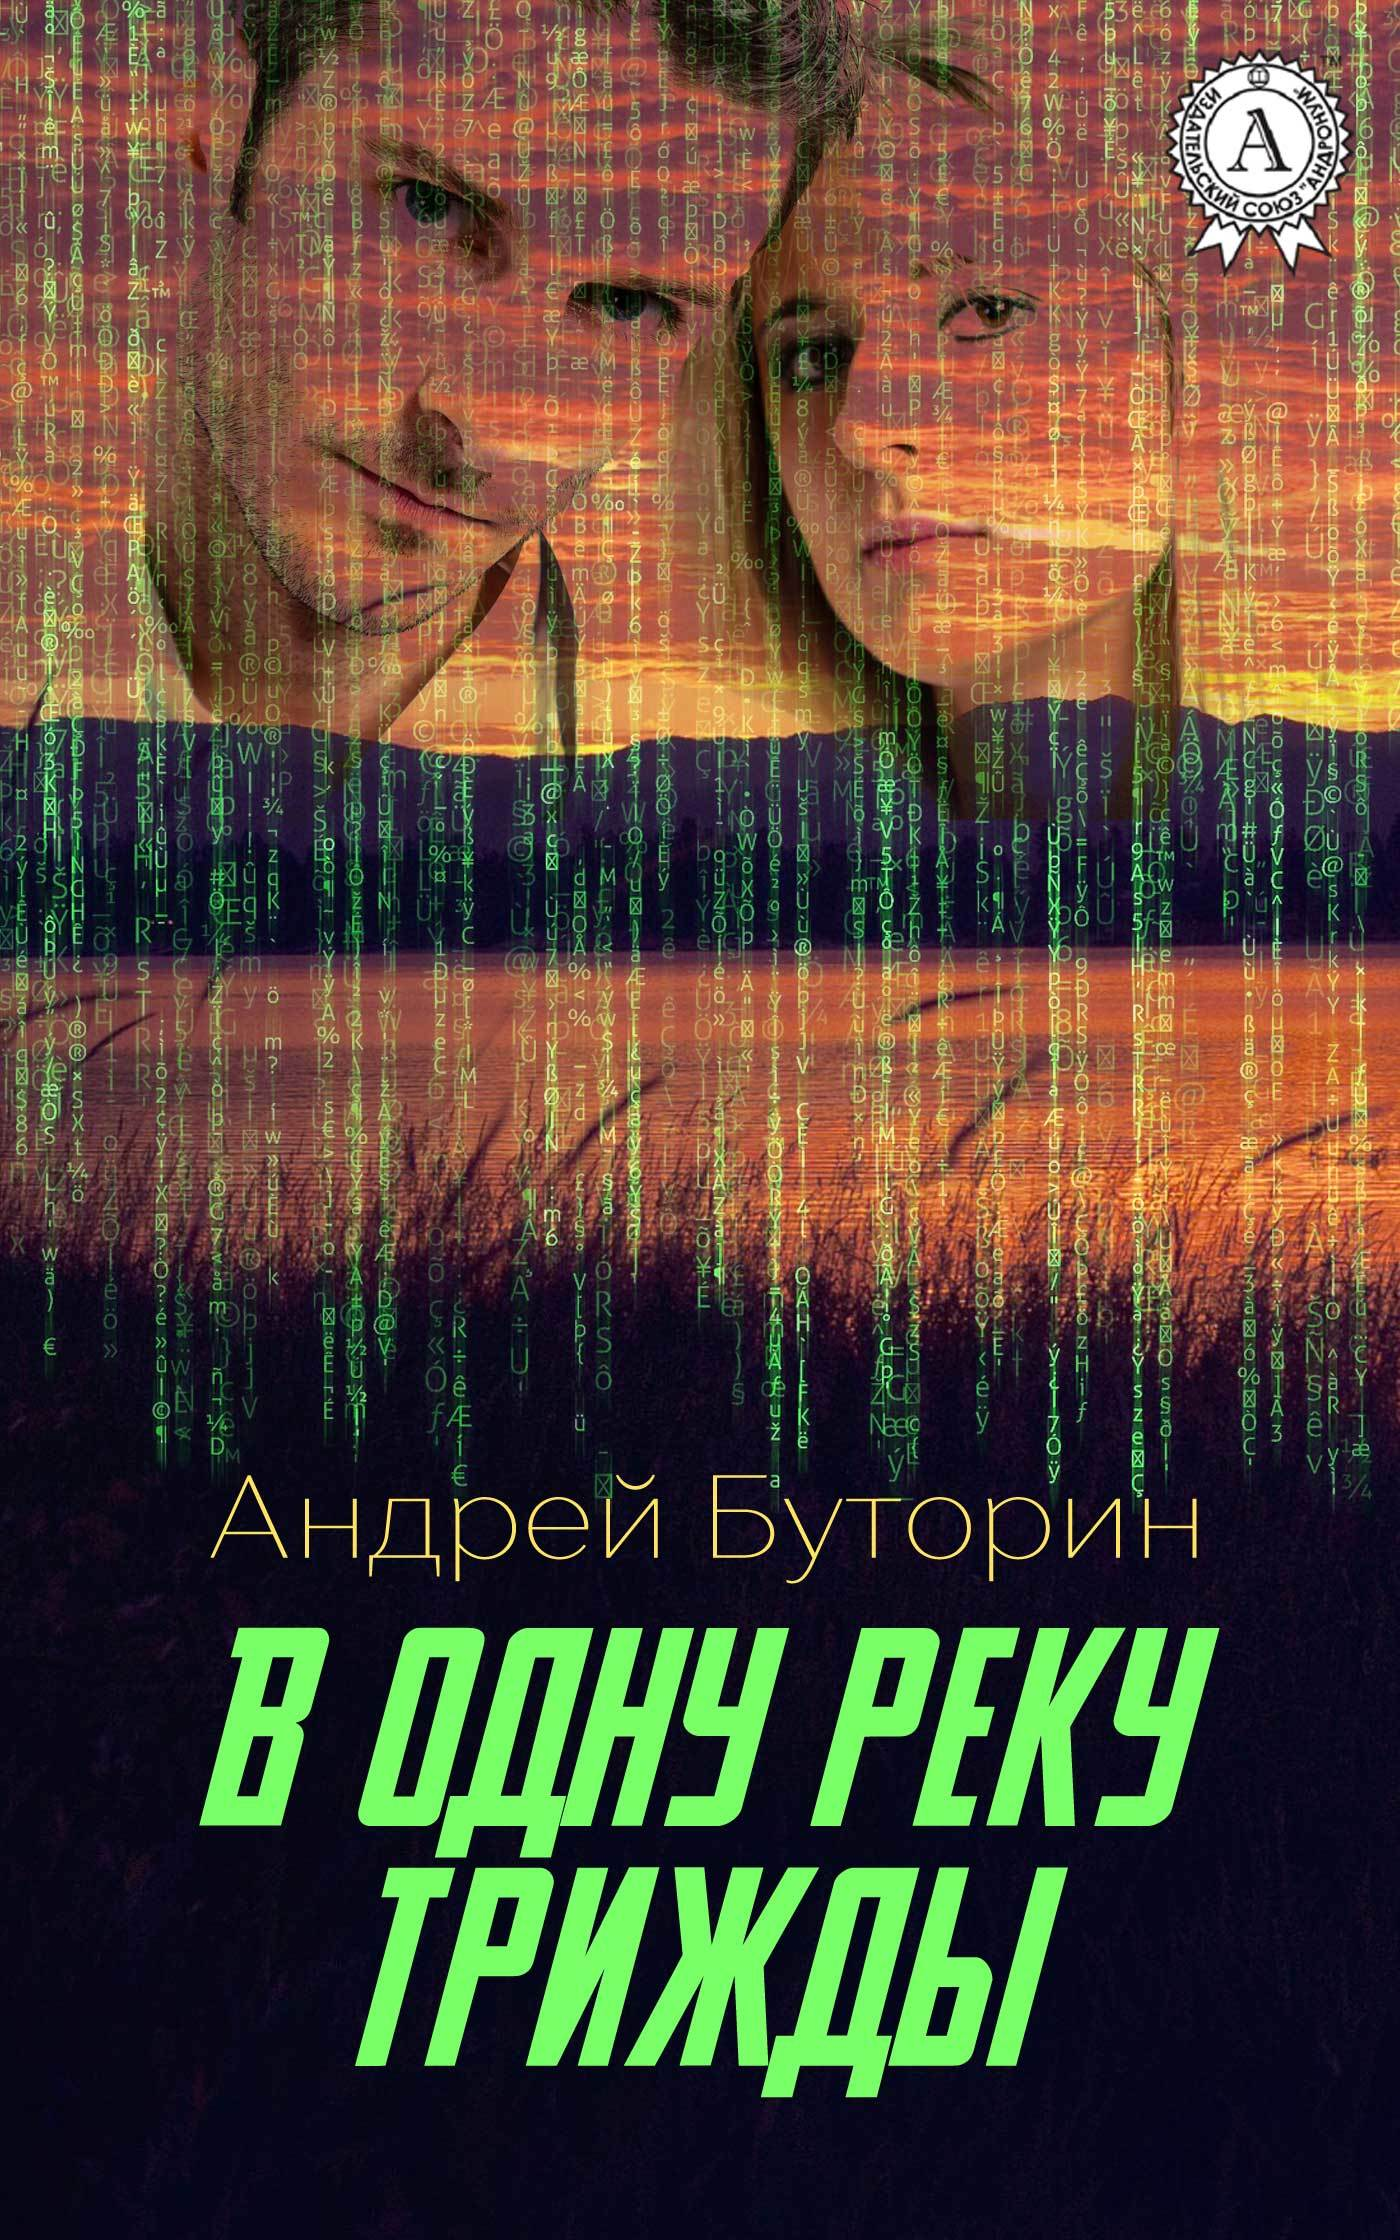 Андрей Буторин В одну реку трижды pois кафтан